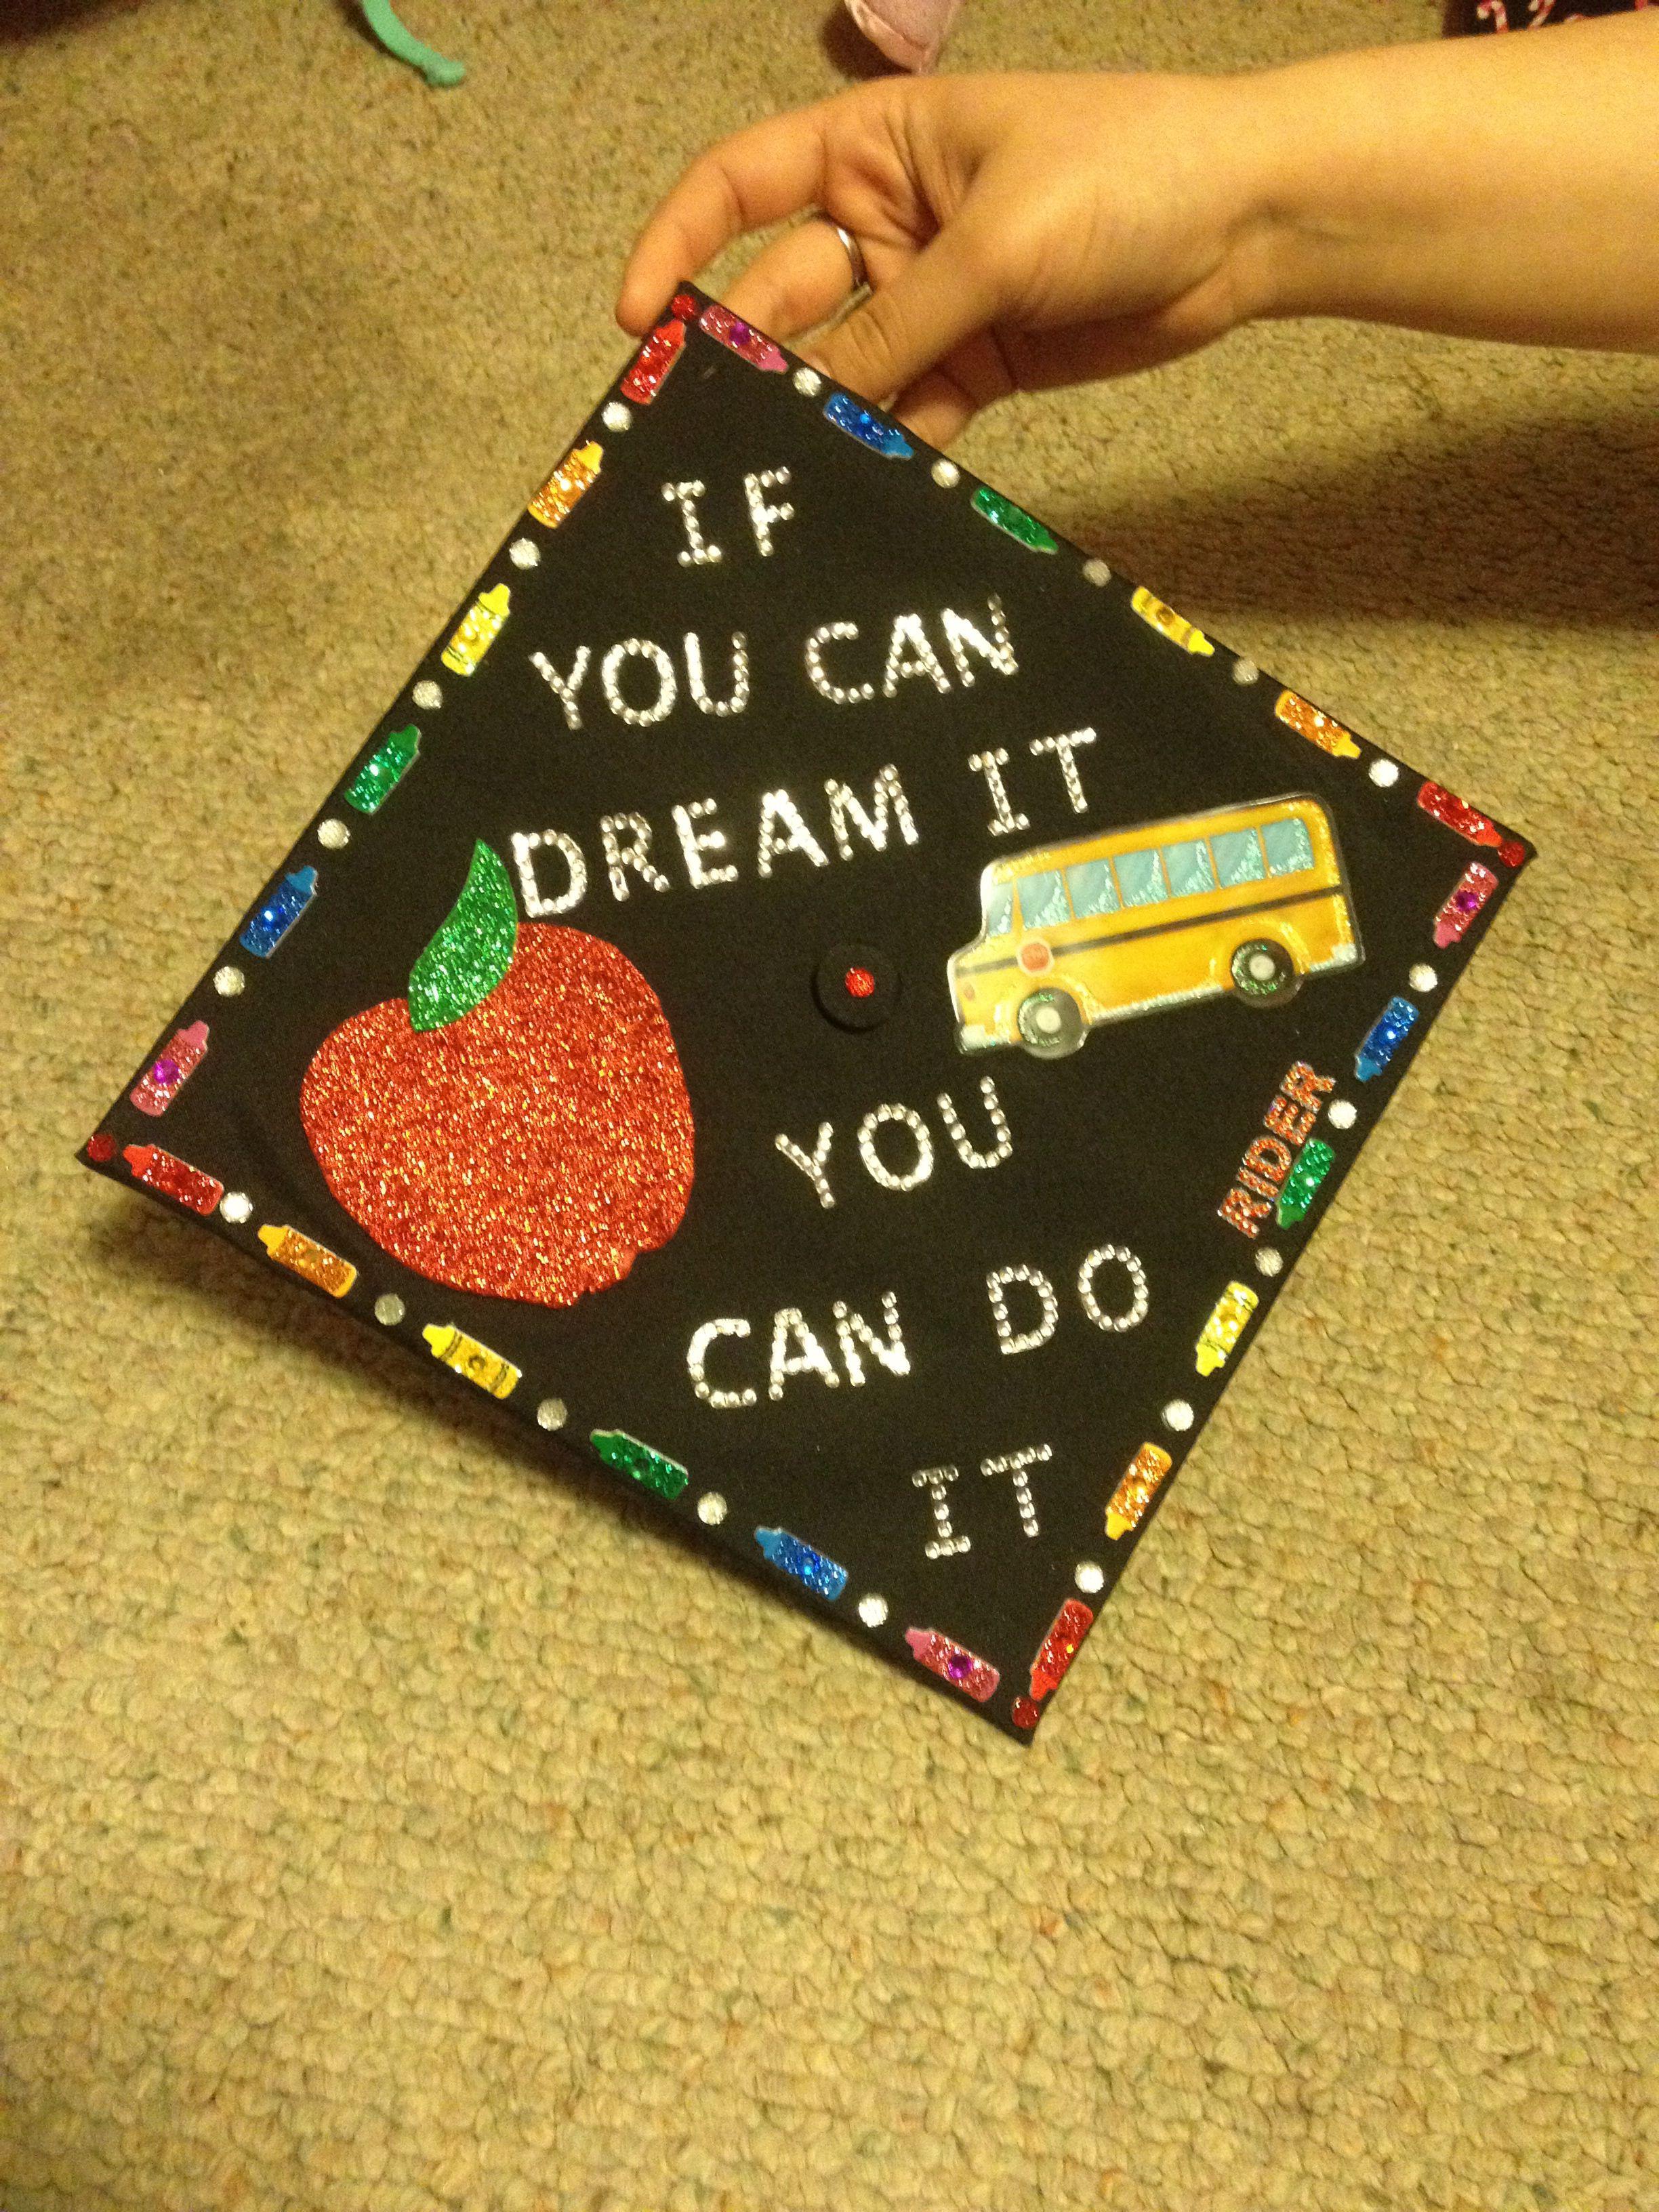 Graduation Cap Education Major Education Major Teacher Graduation Cap Education Graduation Cap